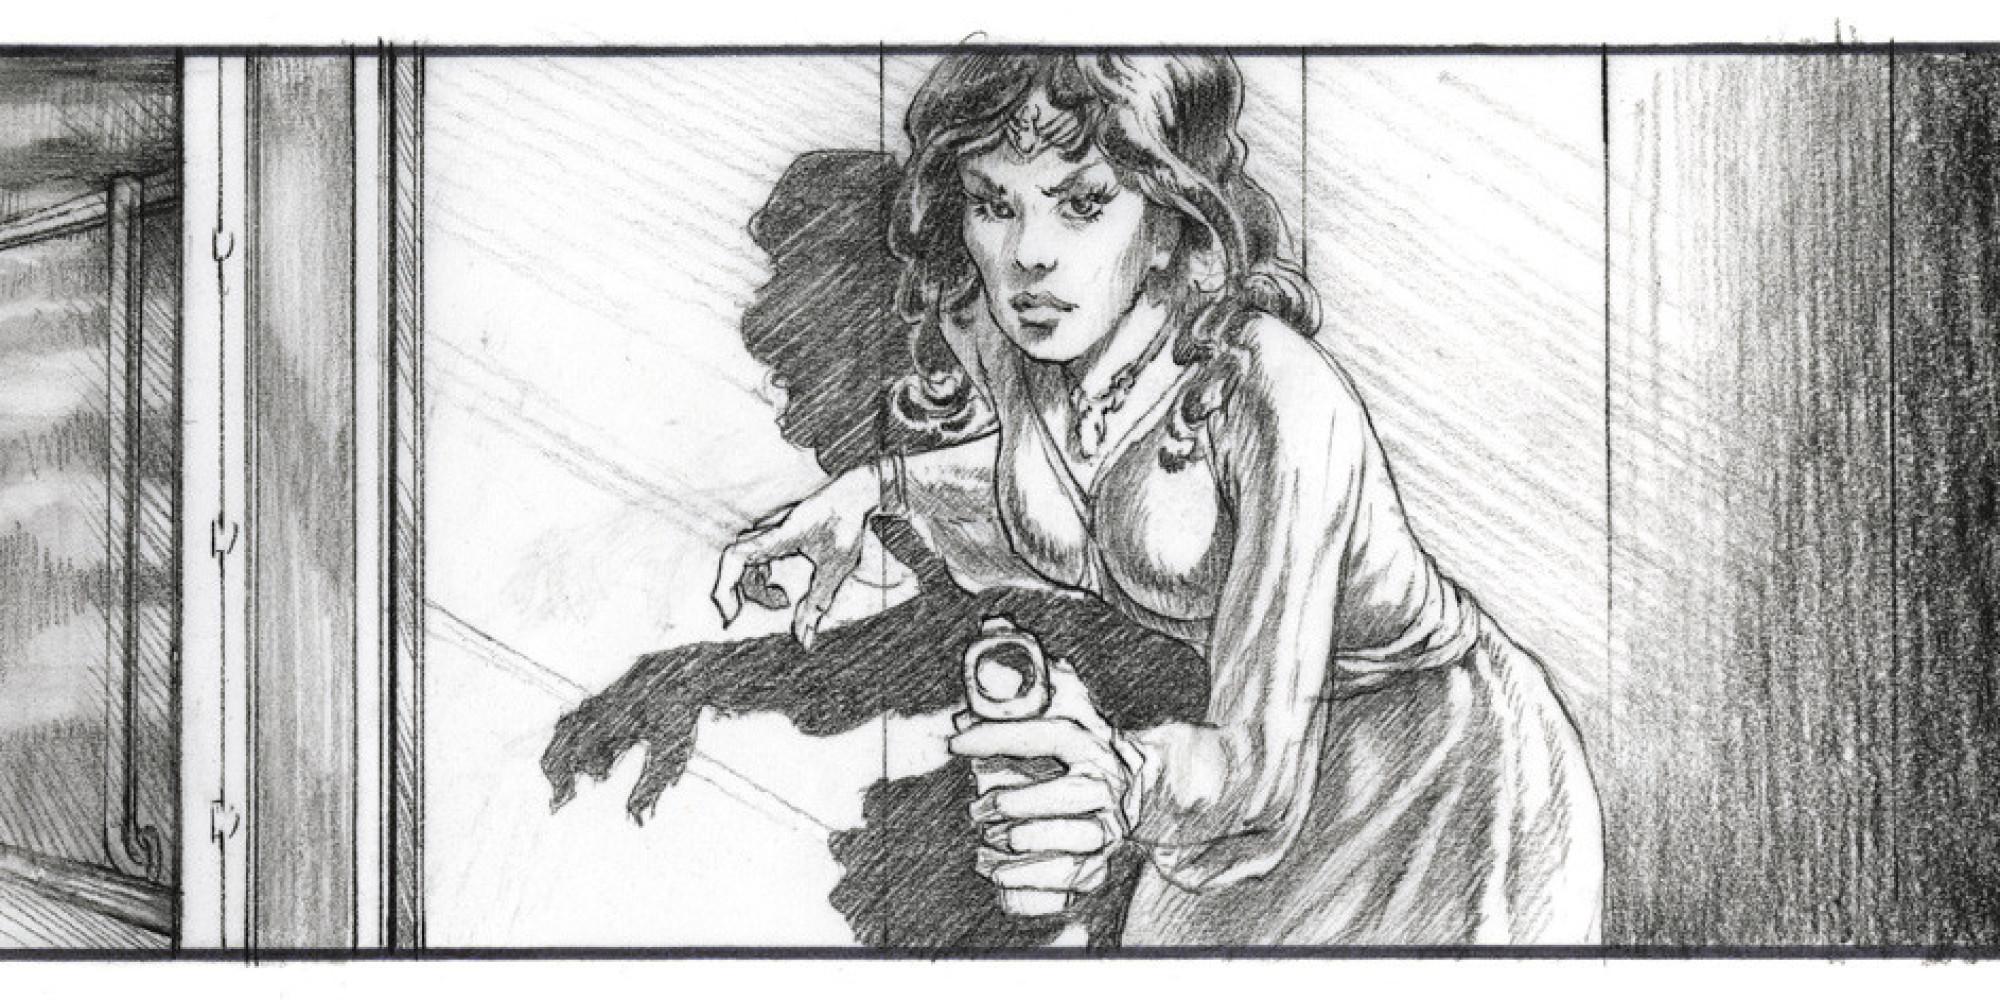 Original Star Wars Storyboards Reveal Lost Obi Wan Kenobi Scene Early Leia Look Huffpost